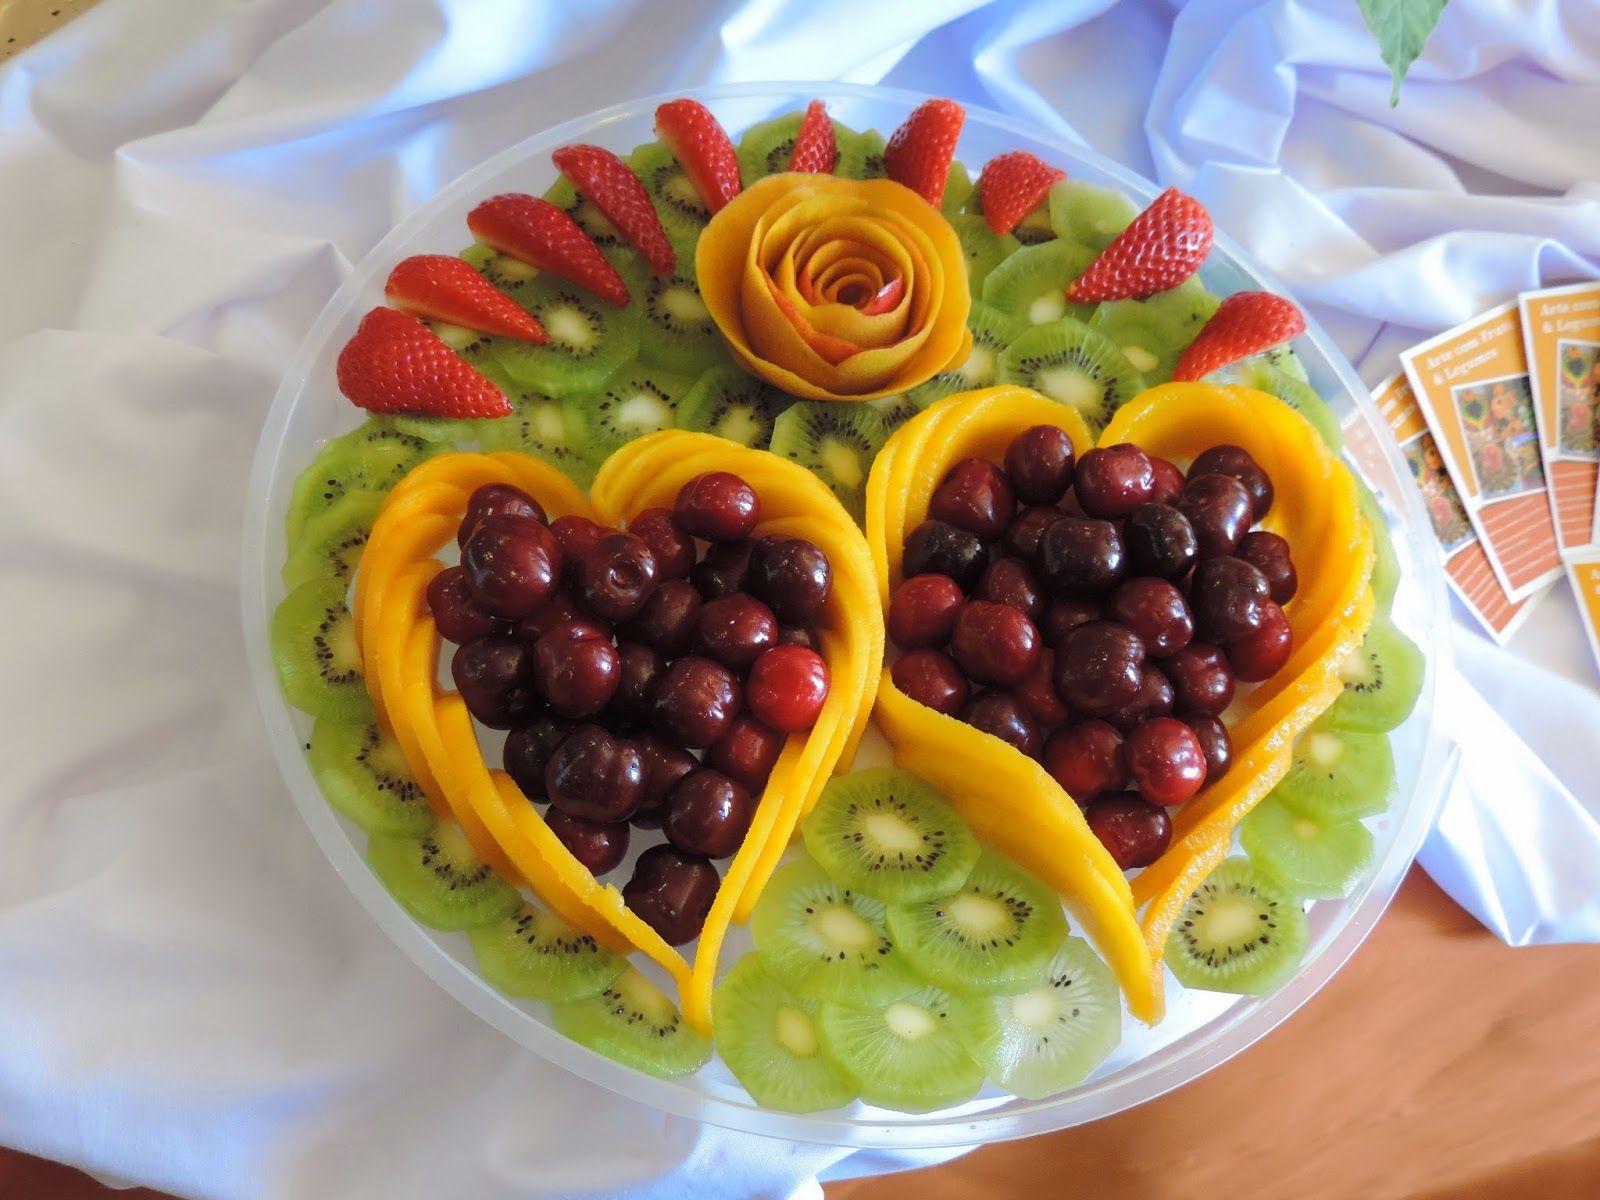 arte com fruta e legumes weeding food in 2018 pinterest obst obstsalat und schnitzen. Black Bedroom Furniture Sets. Home Design Ideas